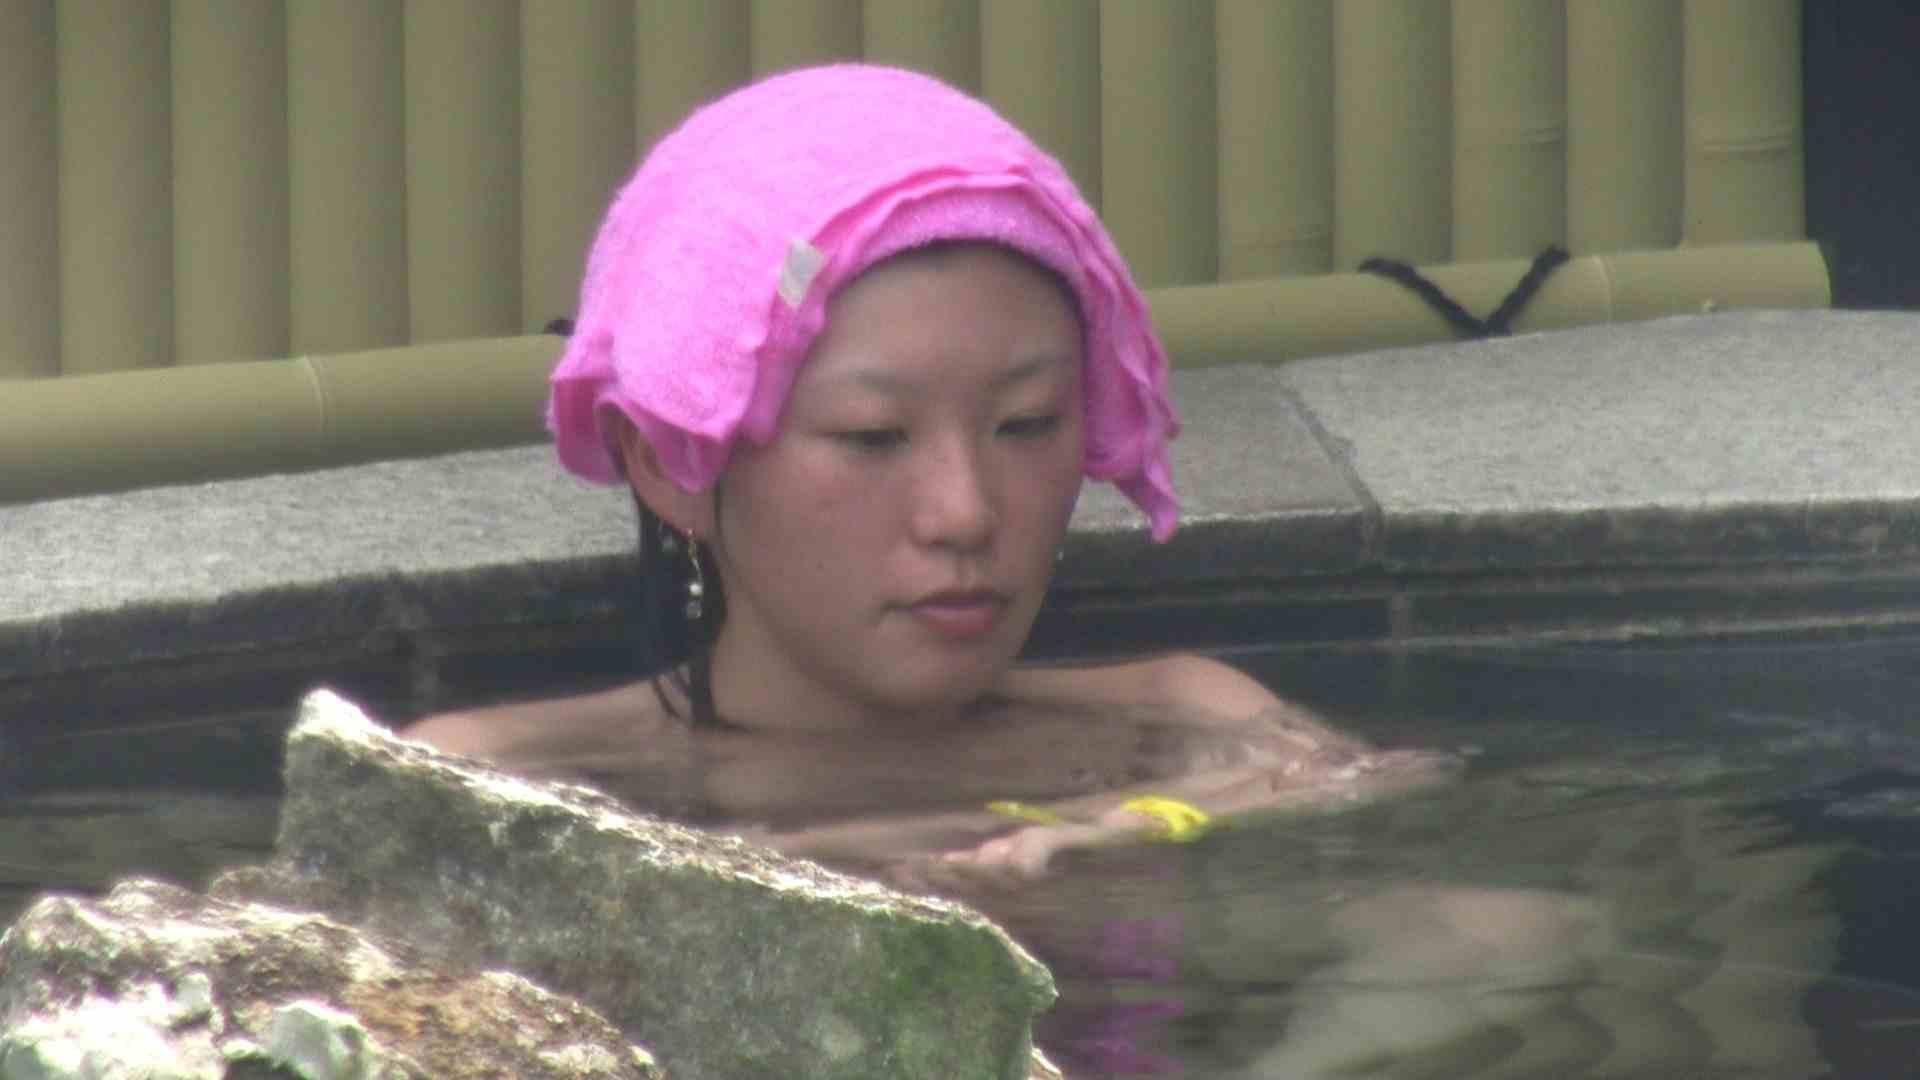 Aquaな露天風呂Vol.127 盗撮師作品 | 露天風呂突入  77pic 40